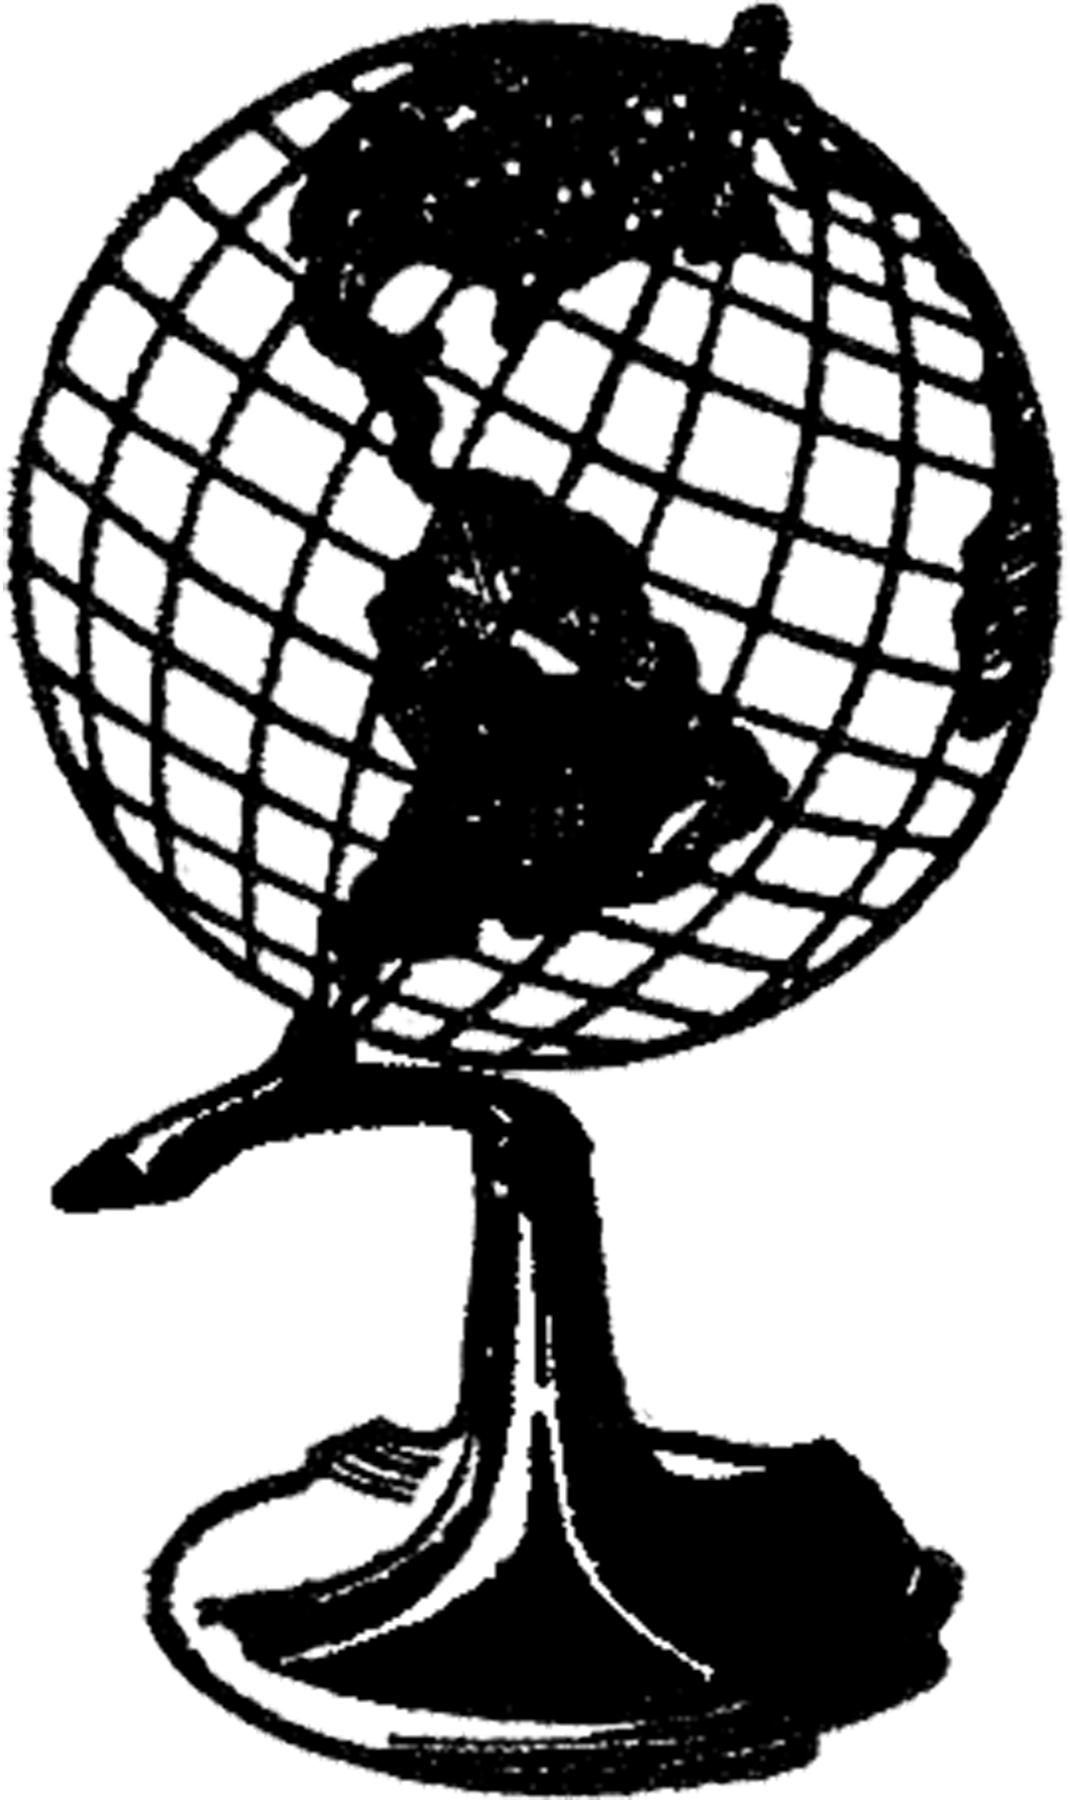 Retro Globe Image! - The Graphics Fairy